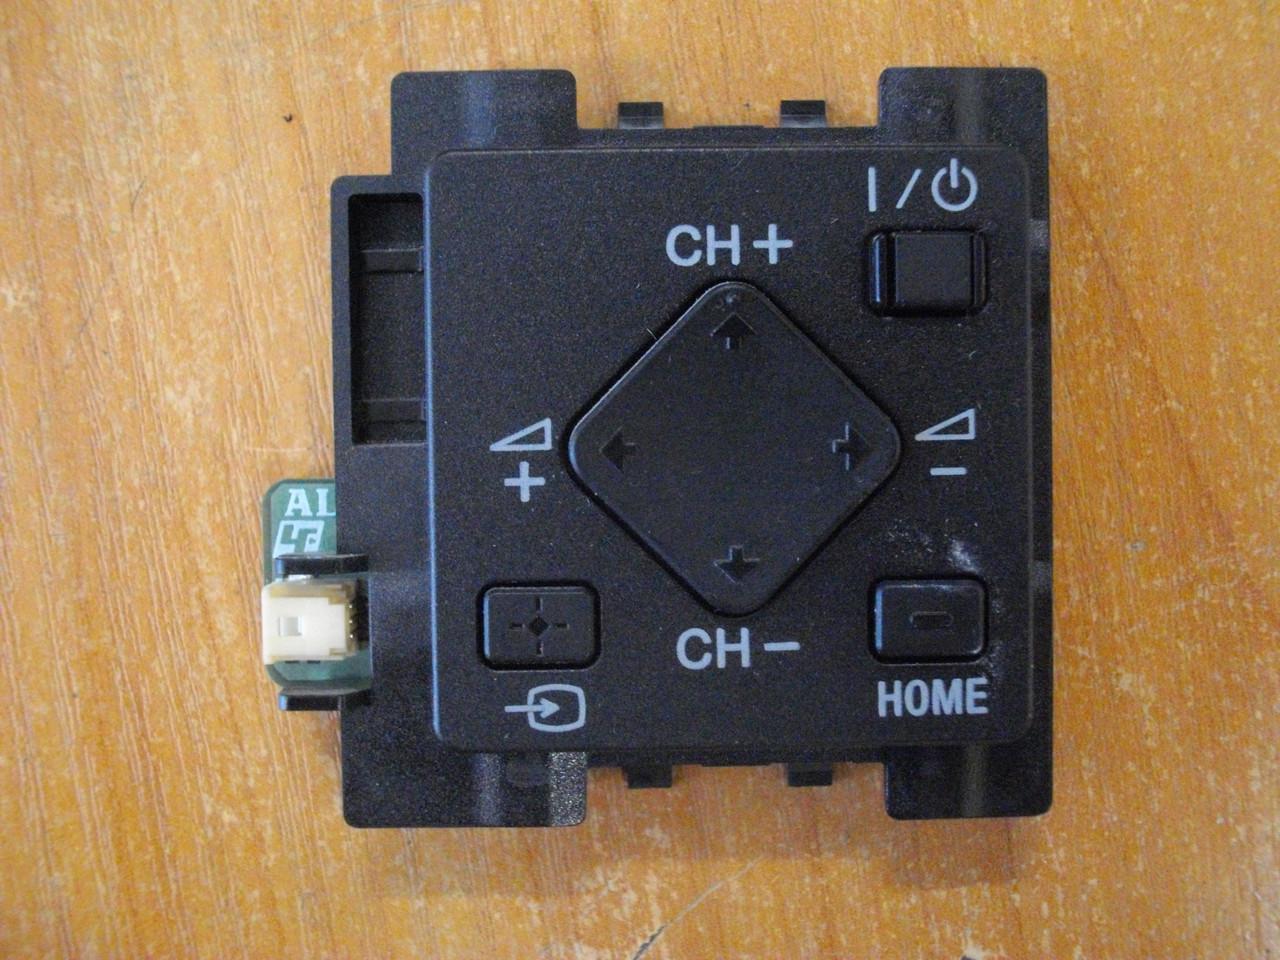 Кнопки управления Sony KDL-40W705C, 2EE-00047BA